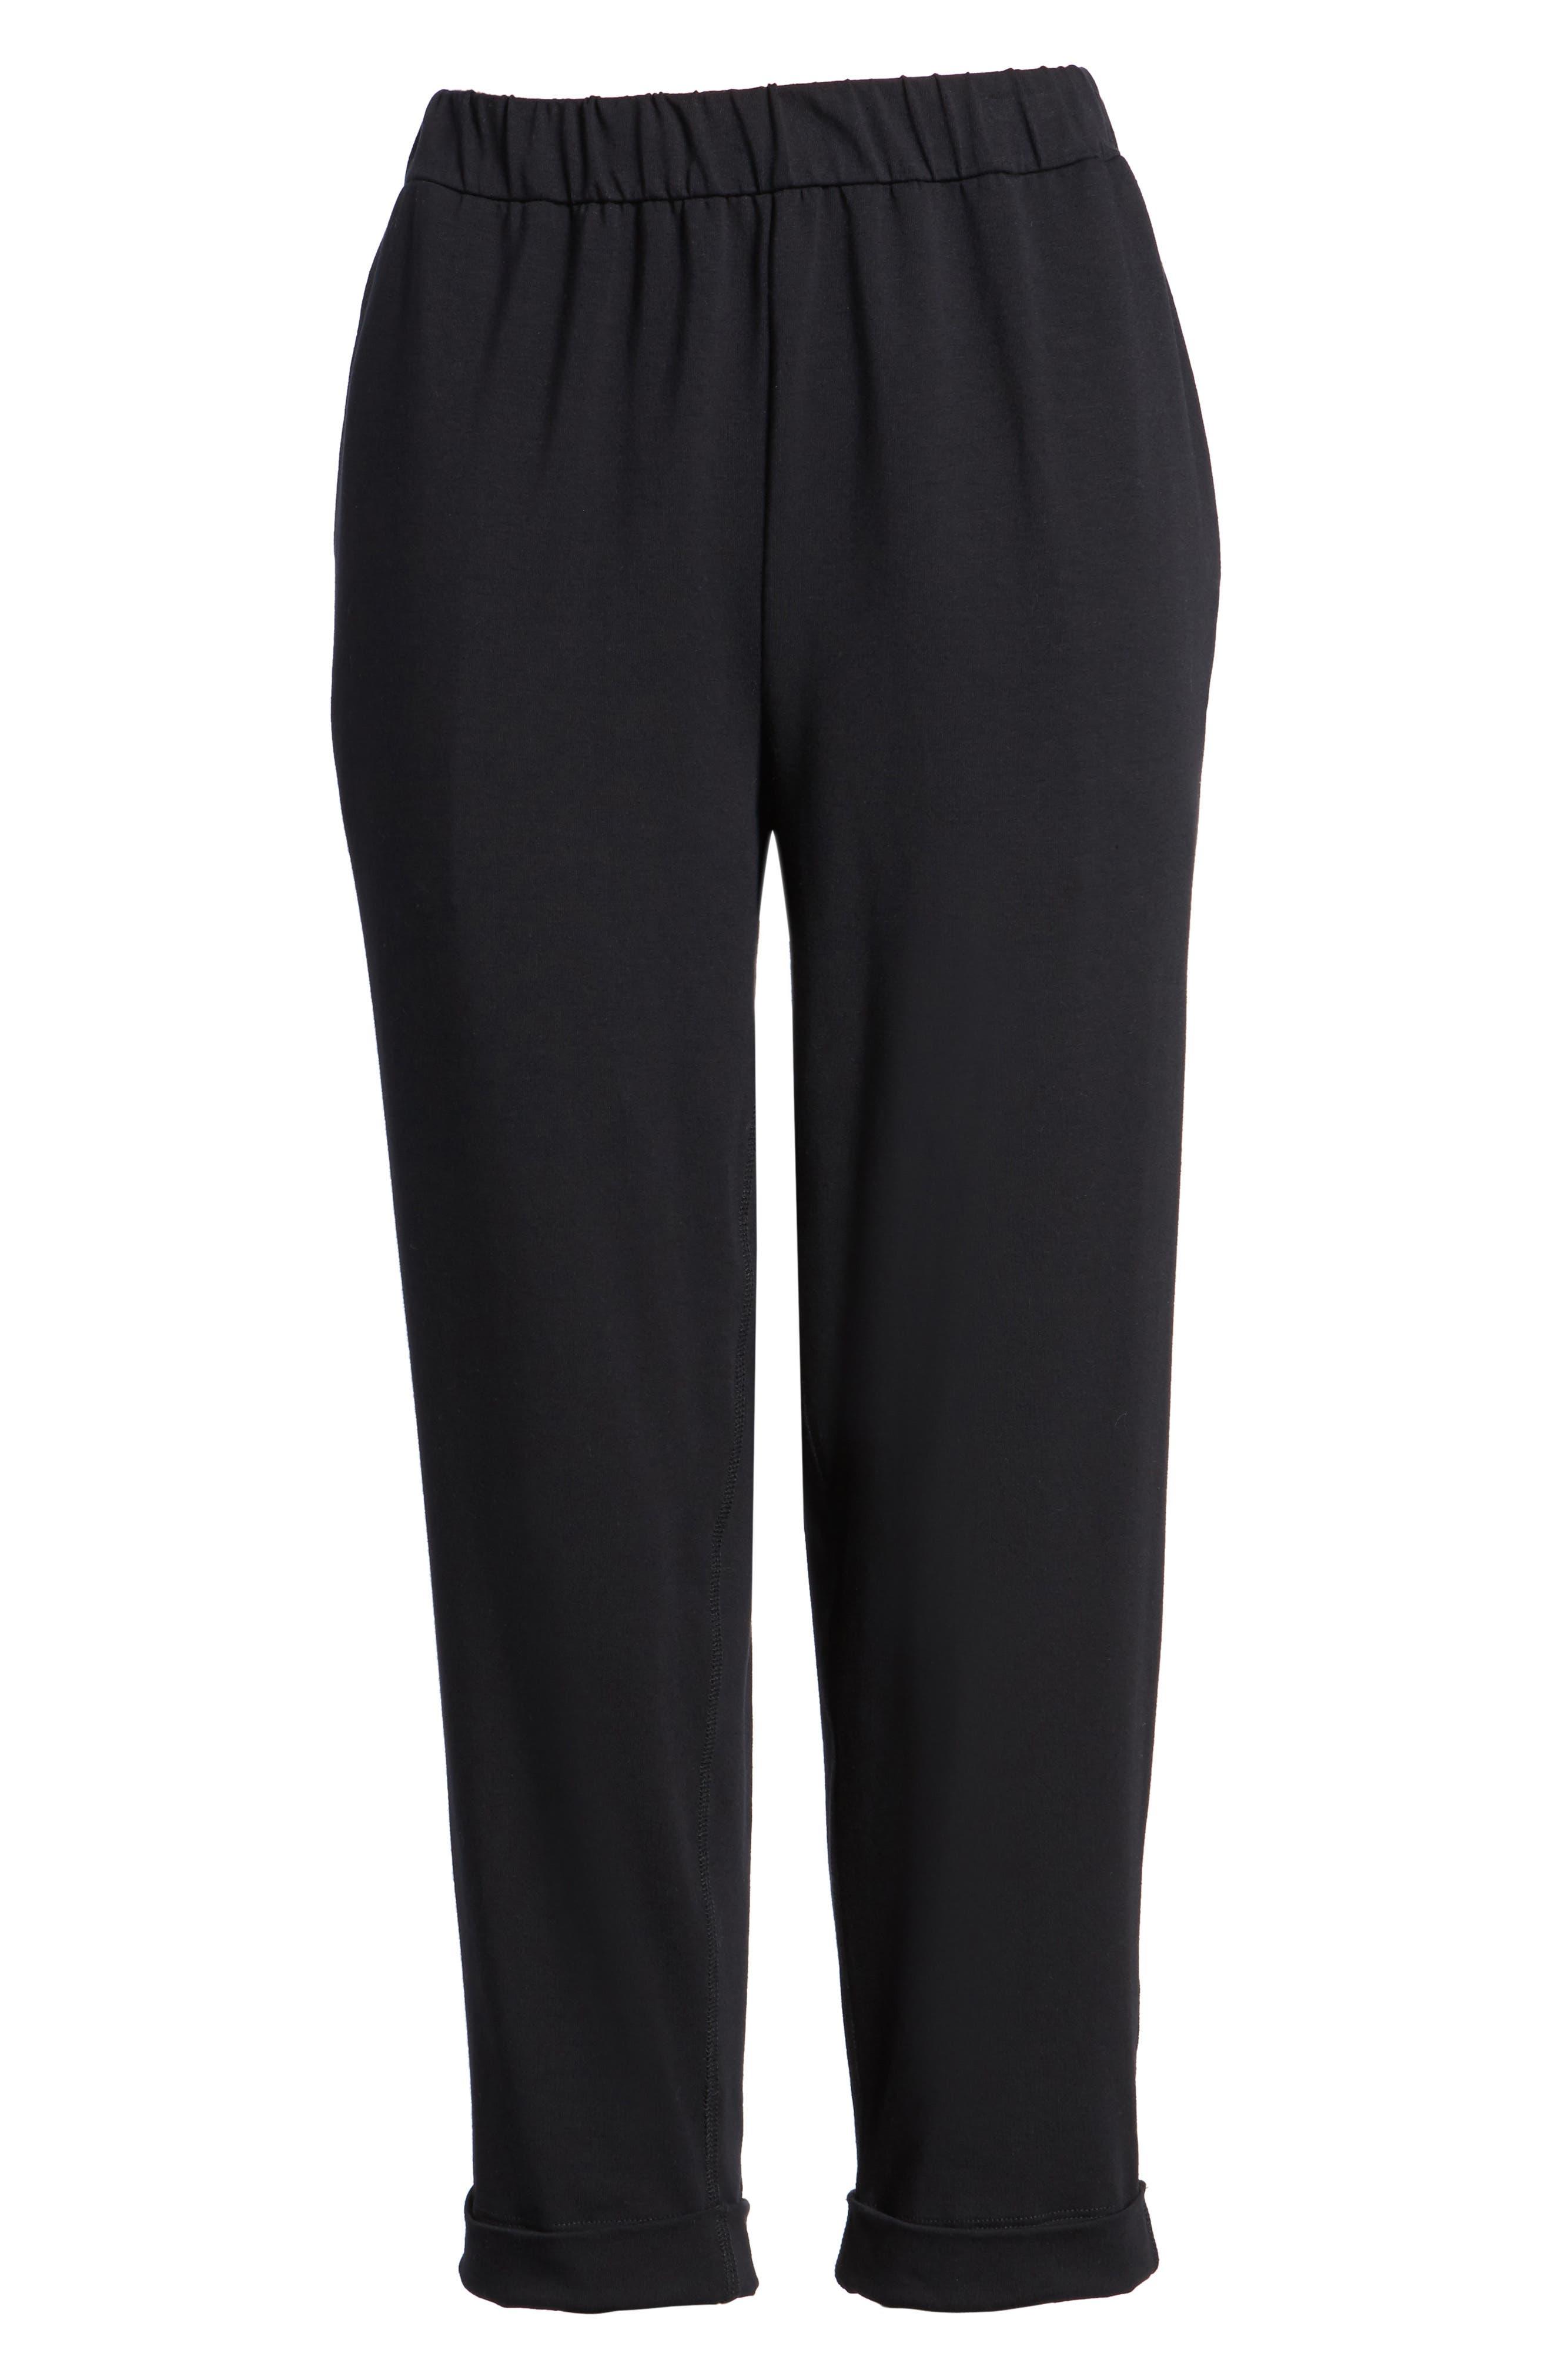 Stretch Organic Cotton Crop Pants,                             Alternate thumbnail 7, color,                             001